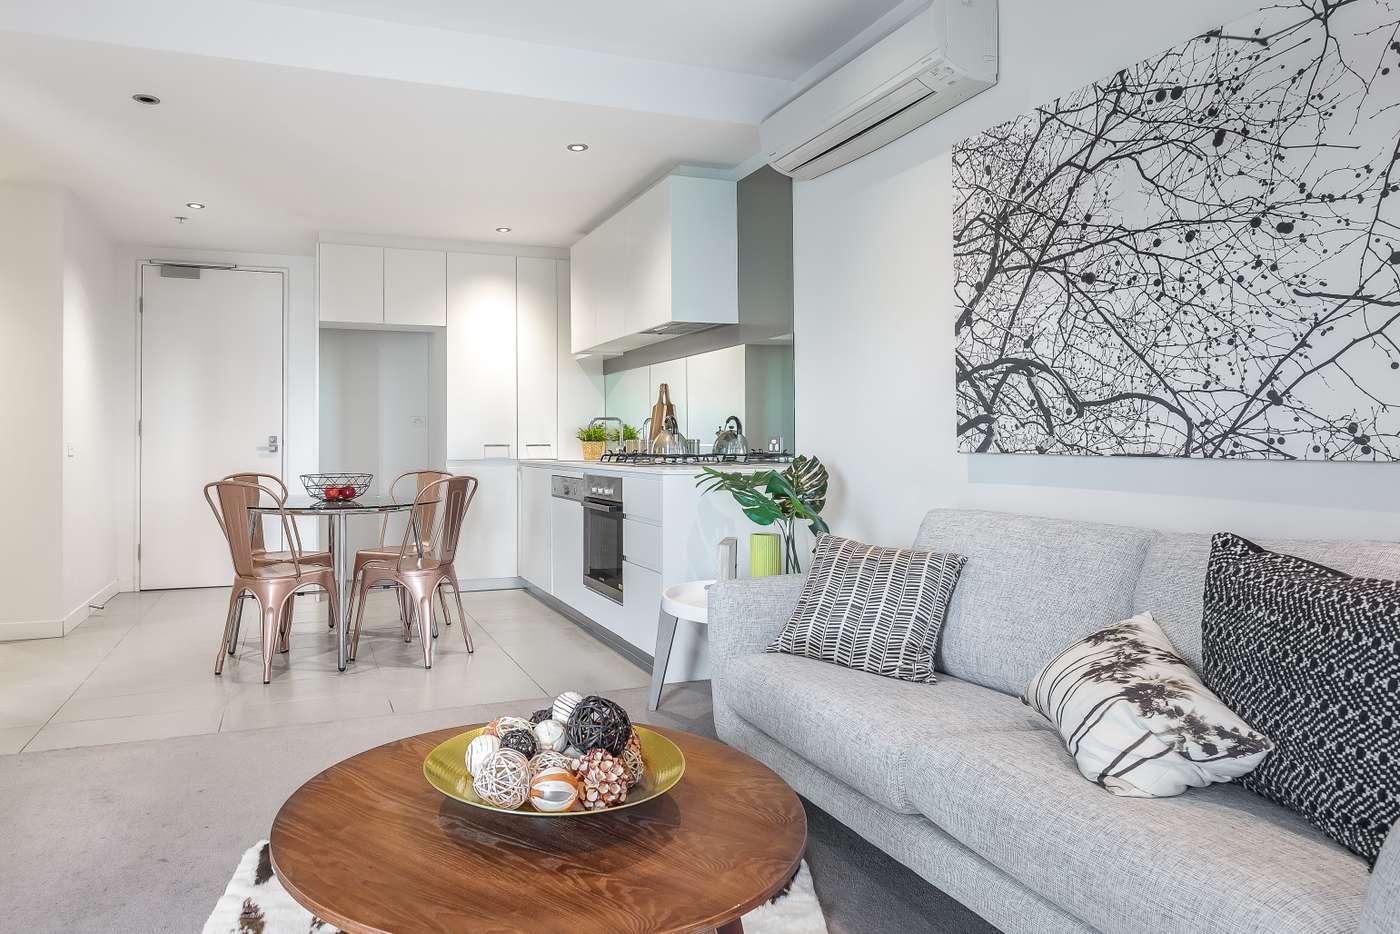 Main view of Homely apartment listing, 901/770B Toorak Road, Glen Iris VIC 3146